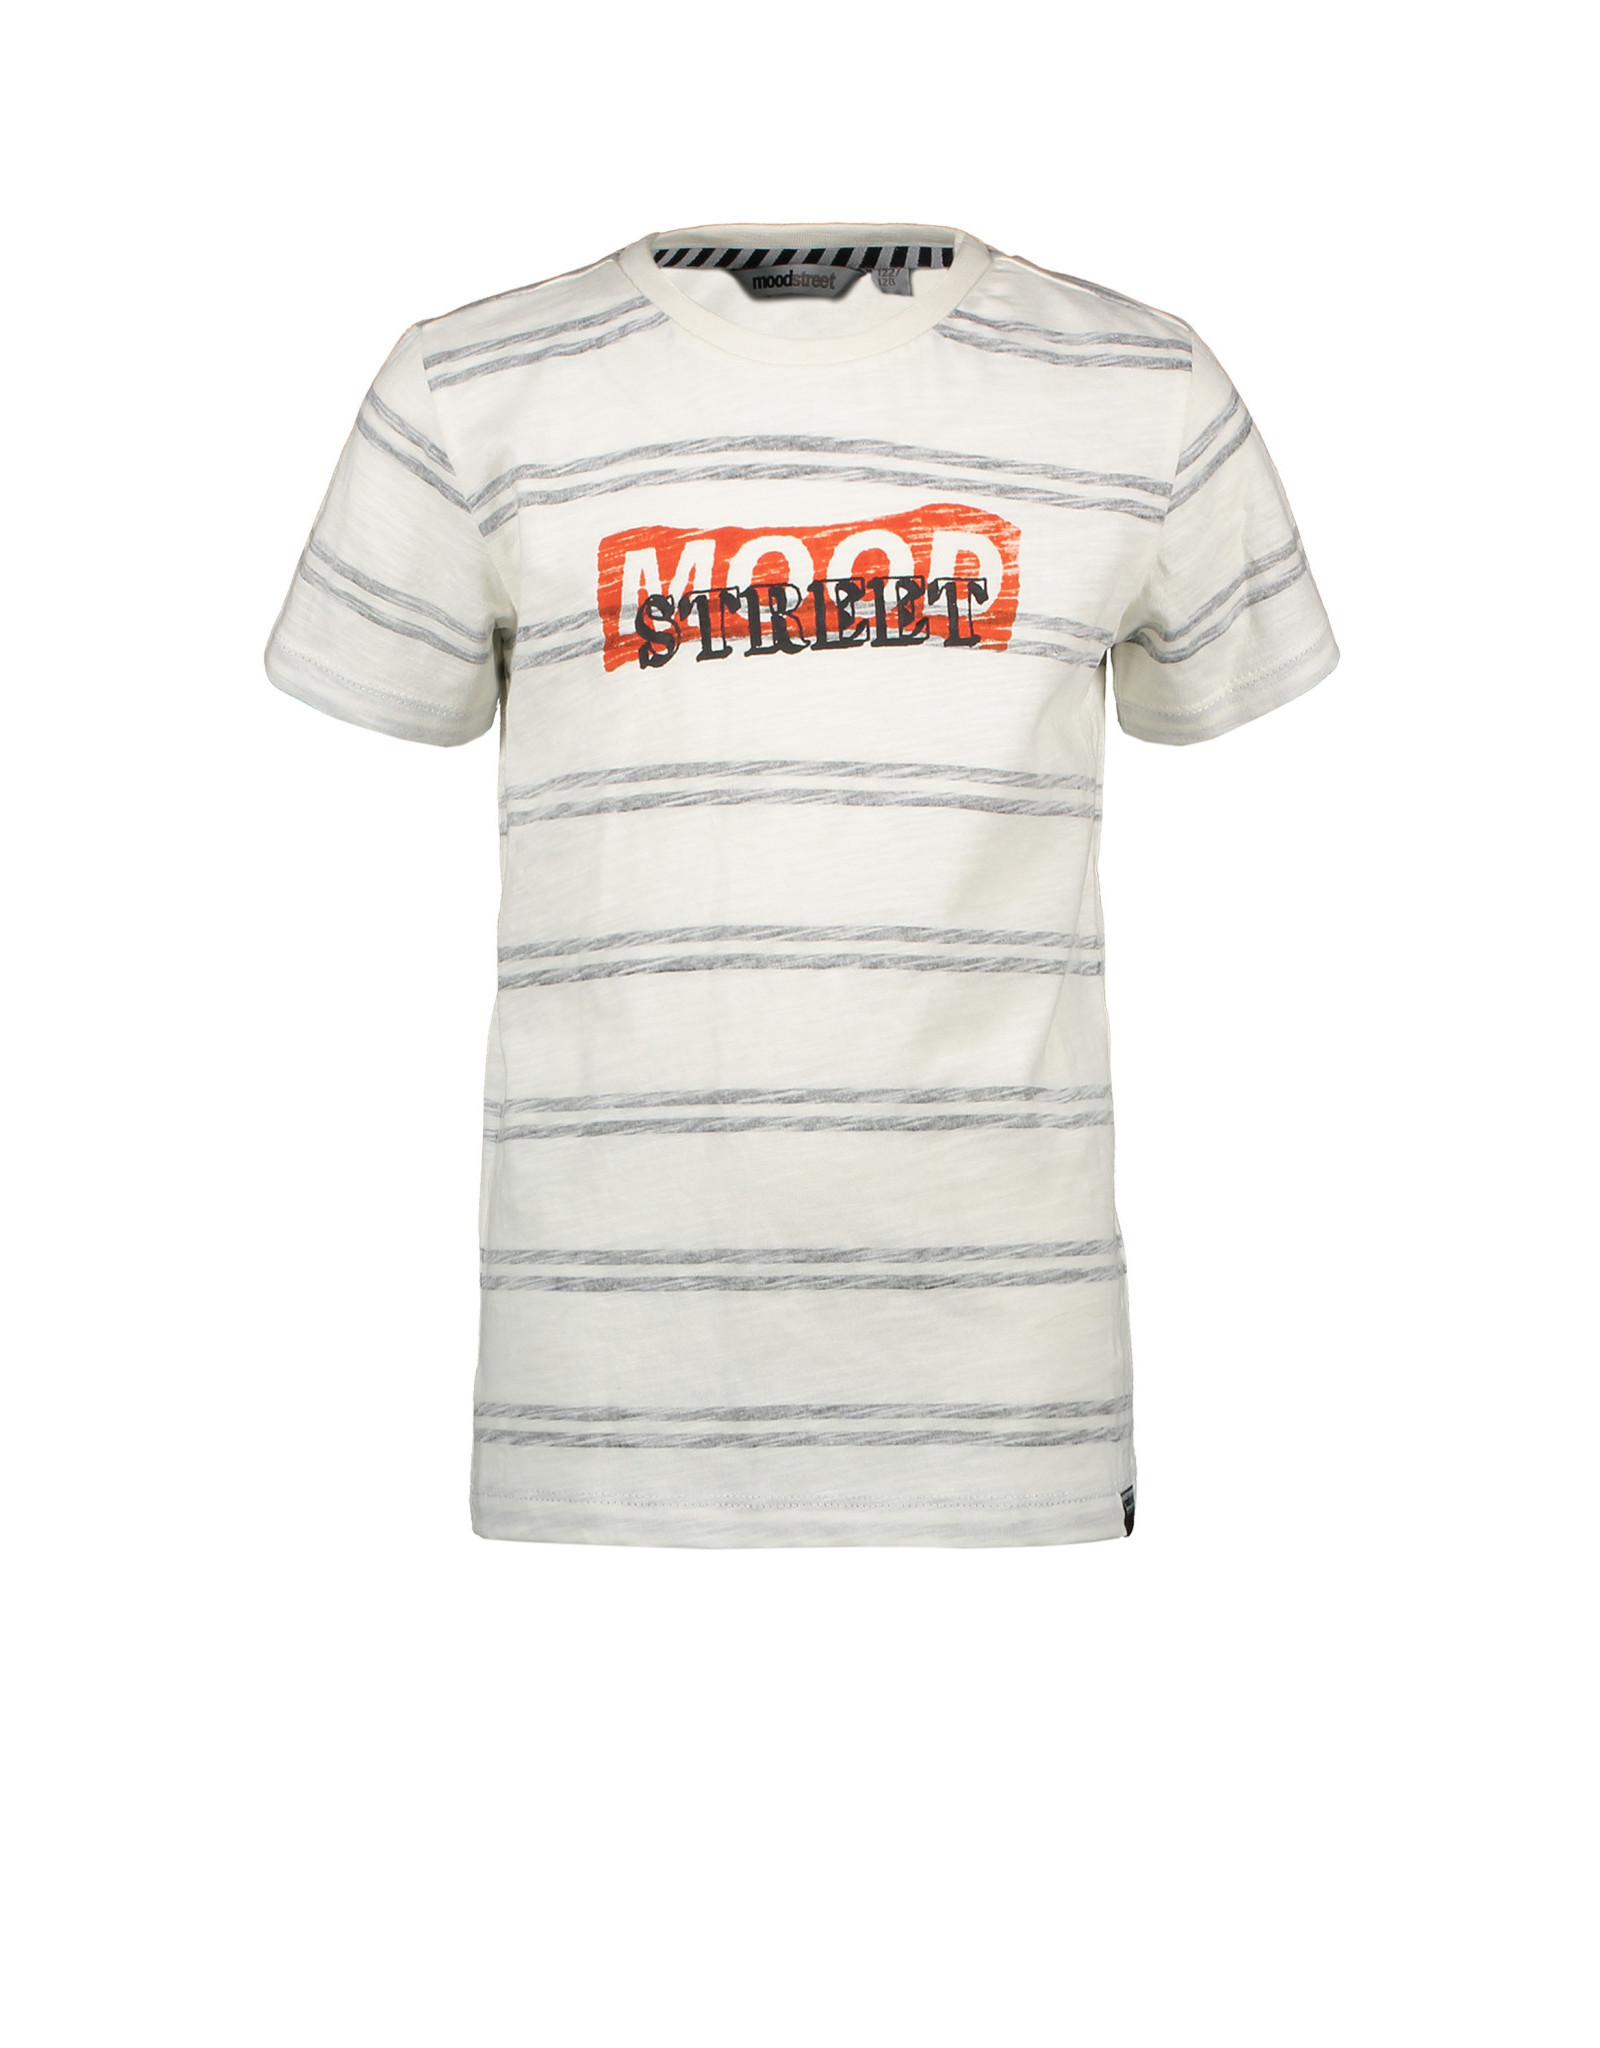 Moodstreet Moodstreet jongens t-shirt Off White Striped